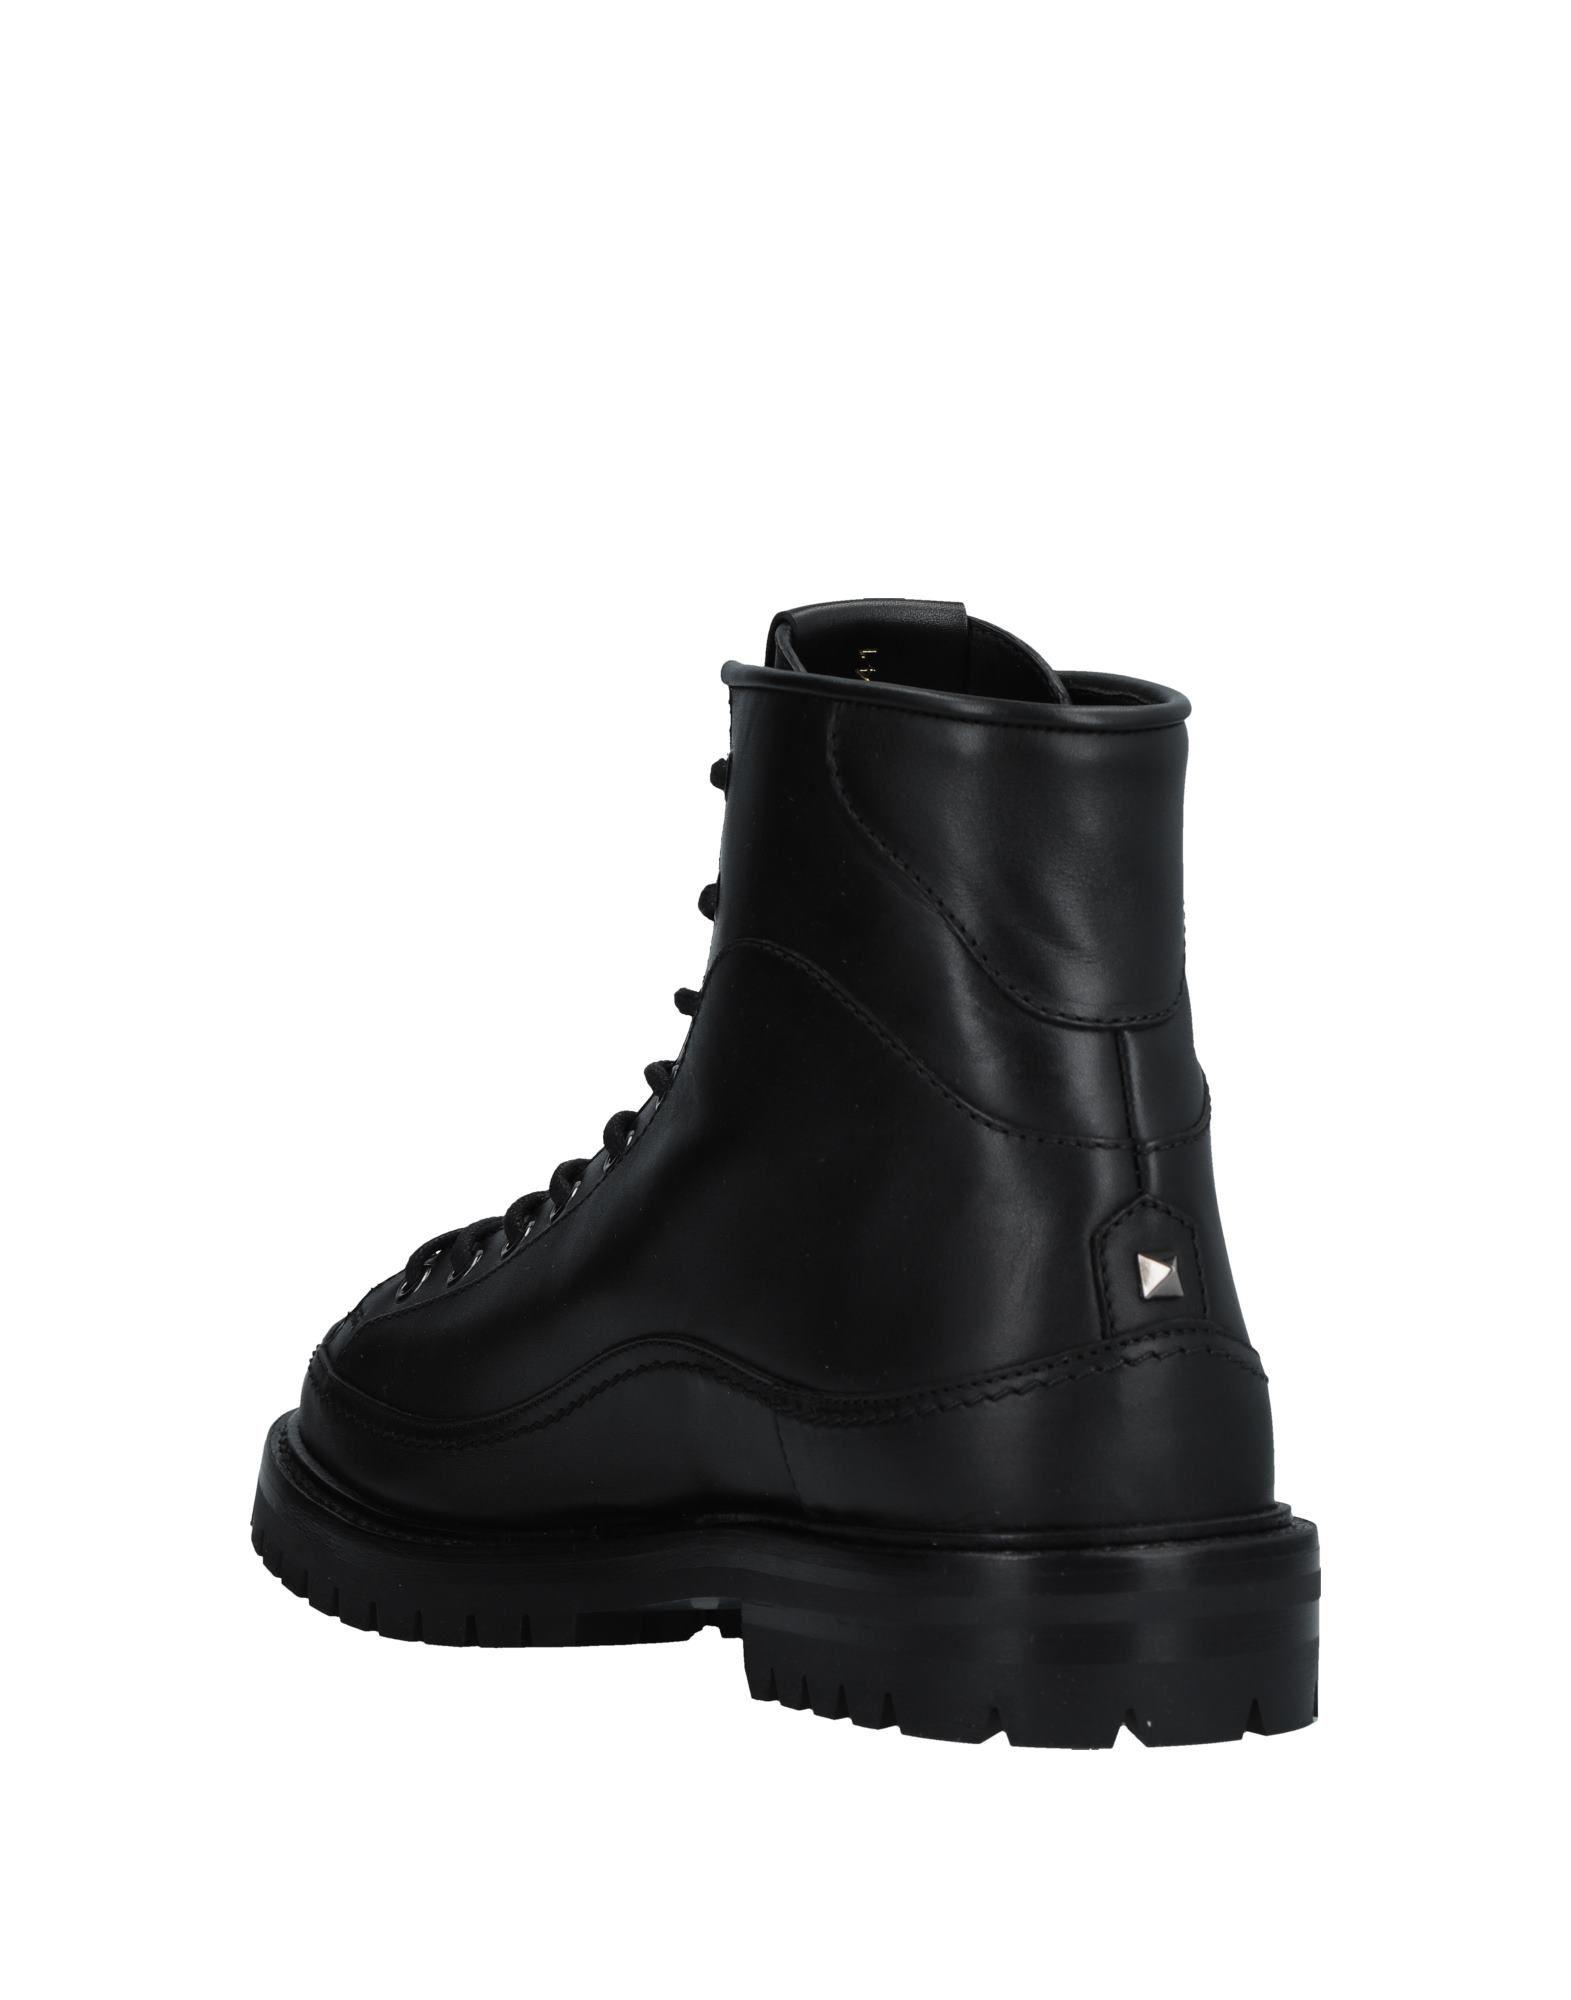 Valentino Garavani Stiefelette Qualität Herren  11515070NS Gute Qualität Stiefelette beliebte Schuhe 5e8e78